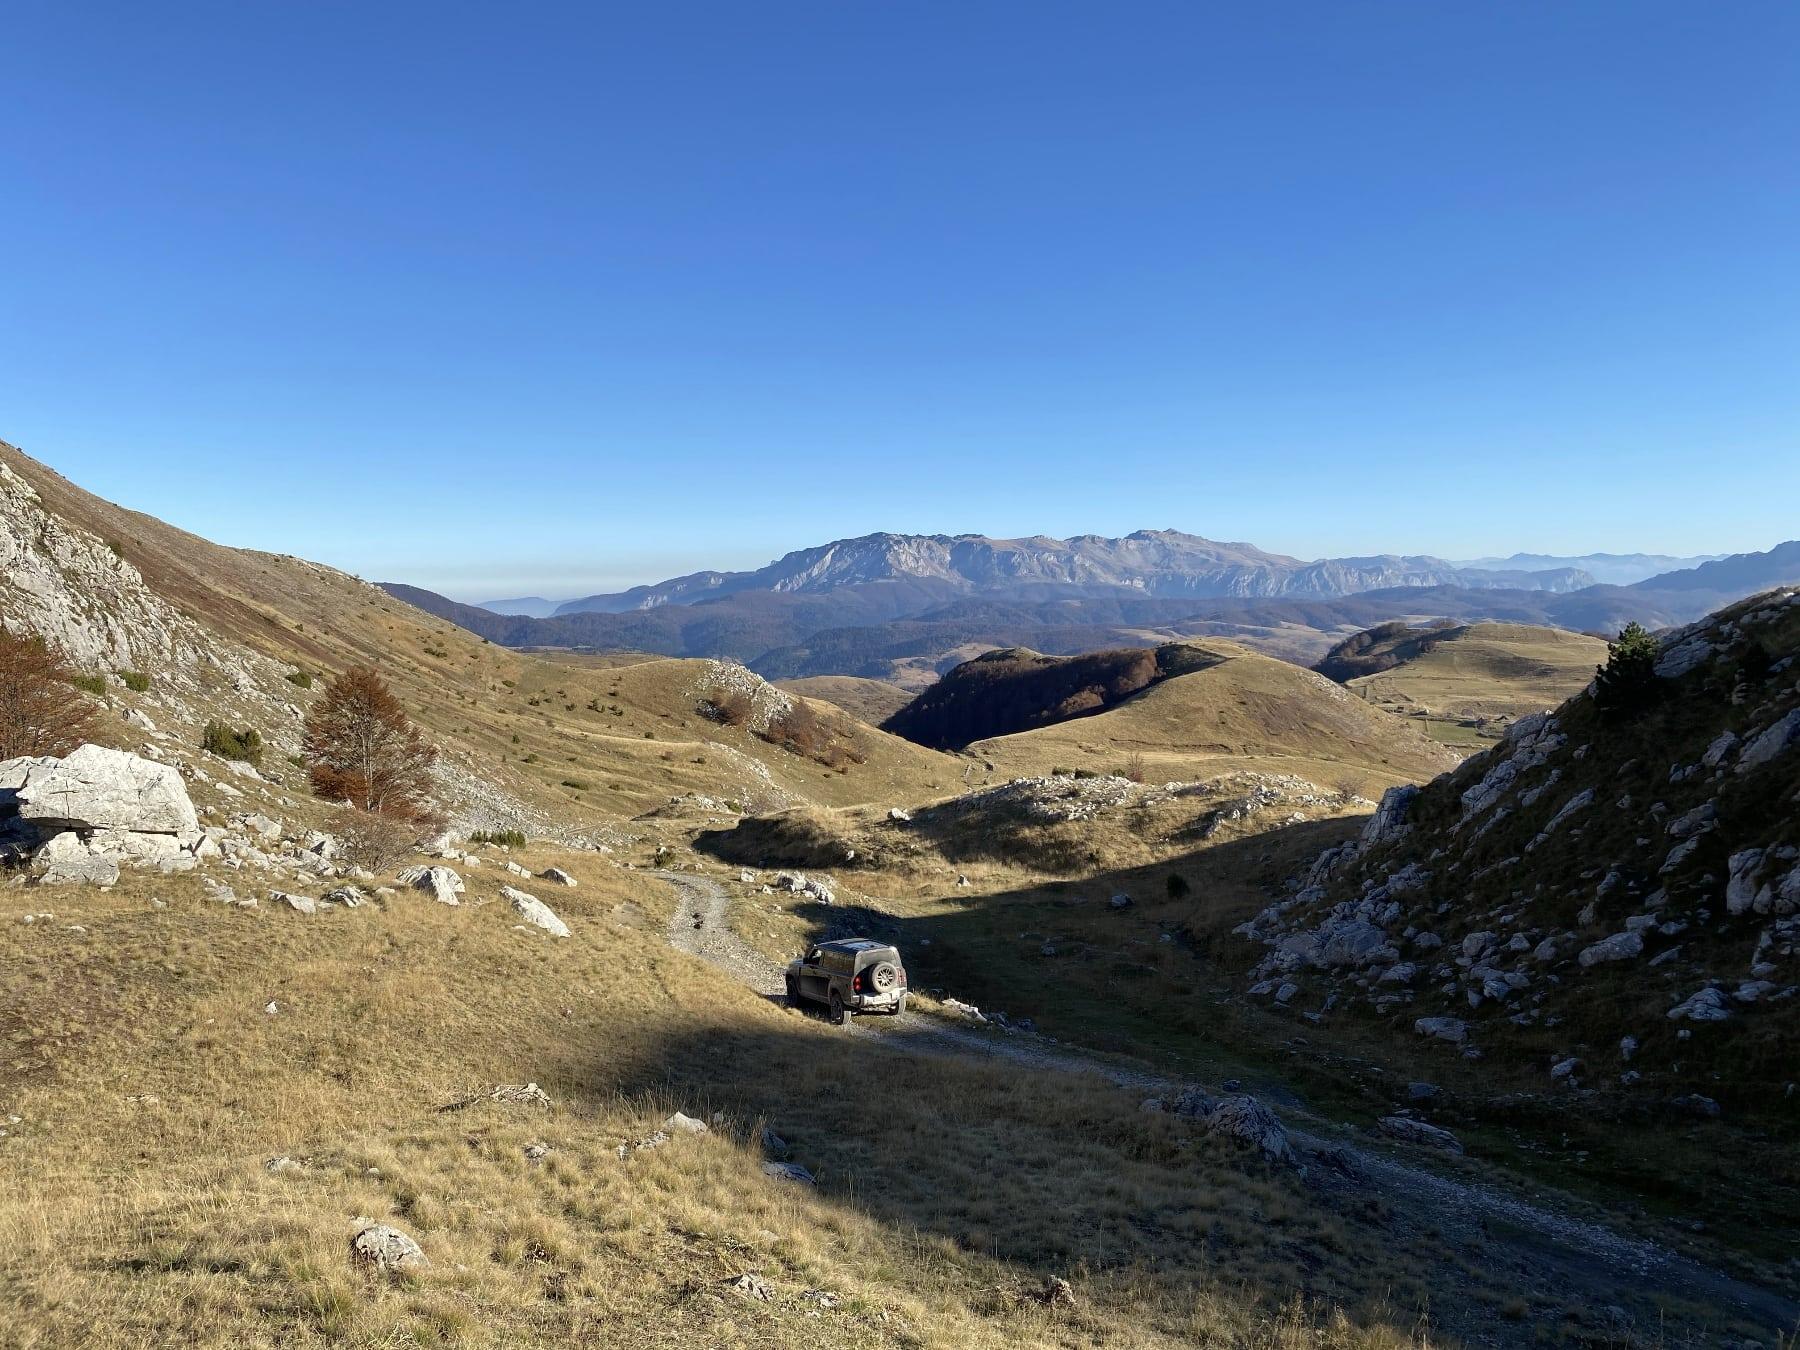 Mountain Village Umoljani - In Search of the Stone Dragon 3